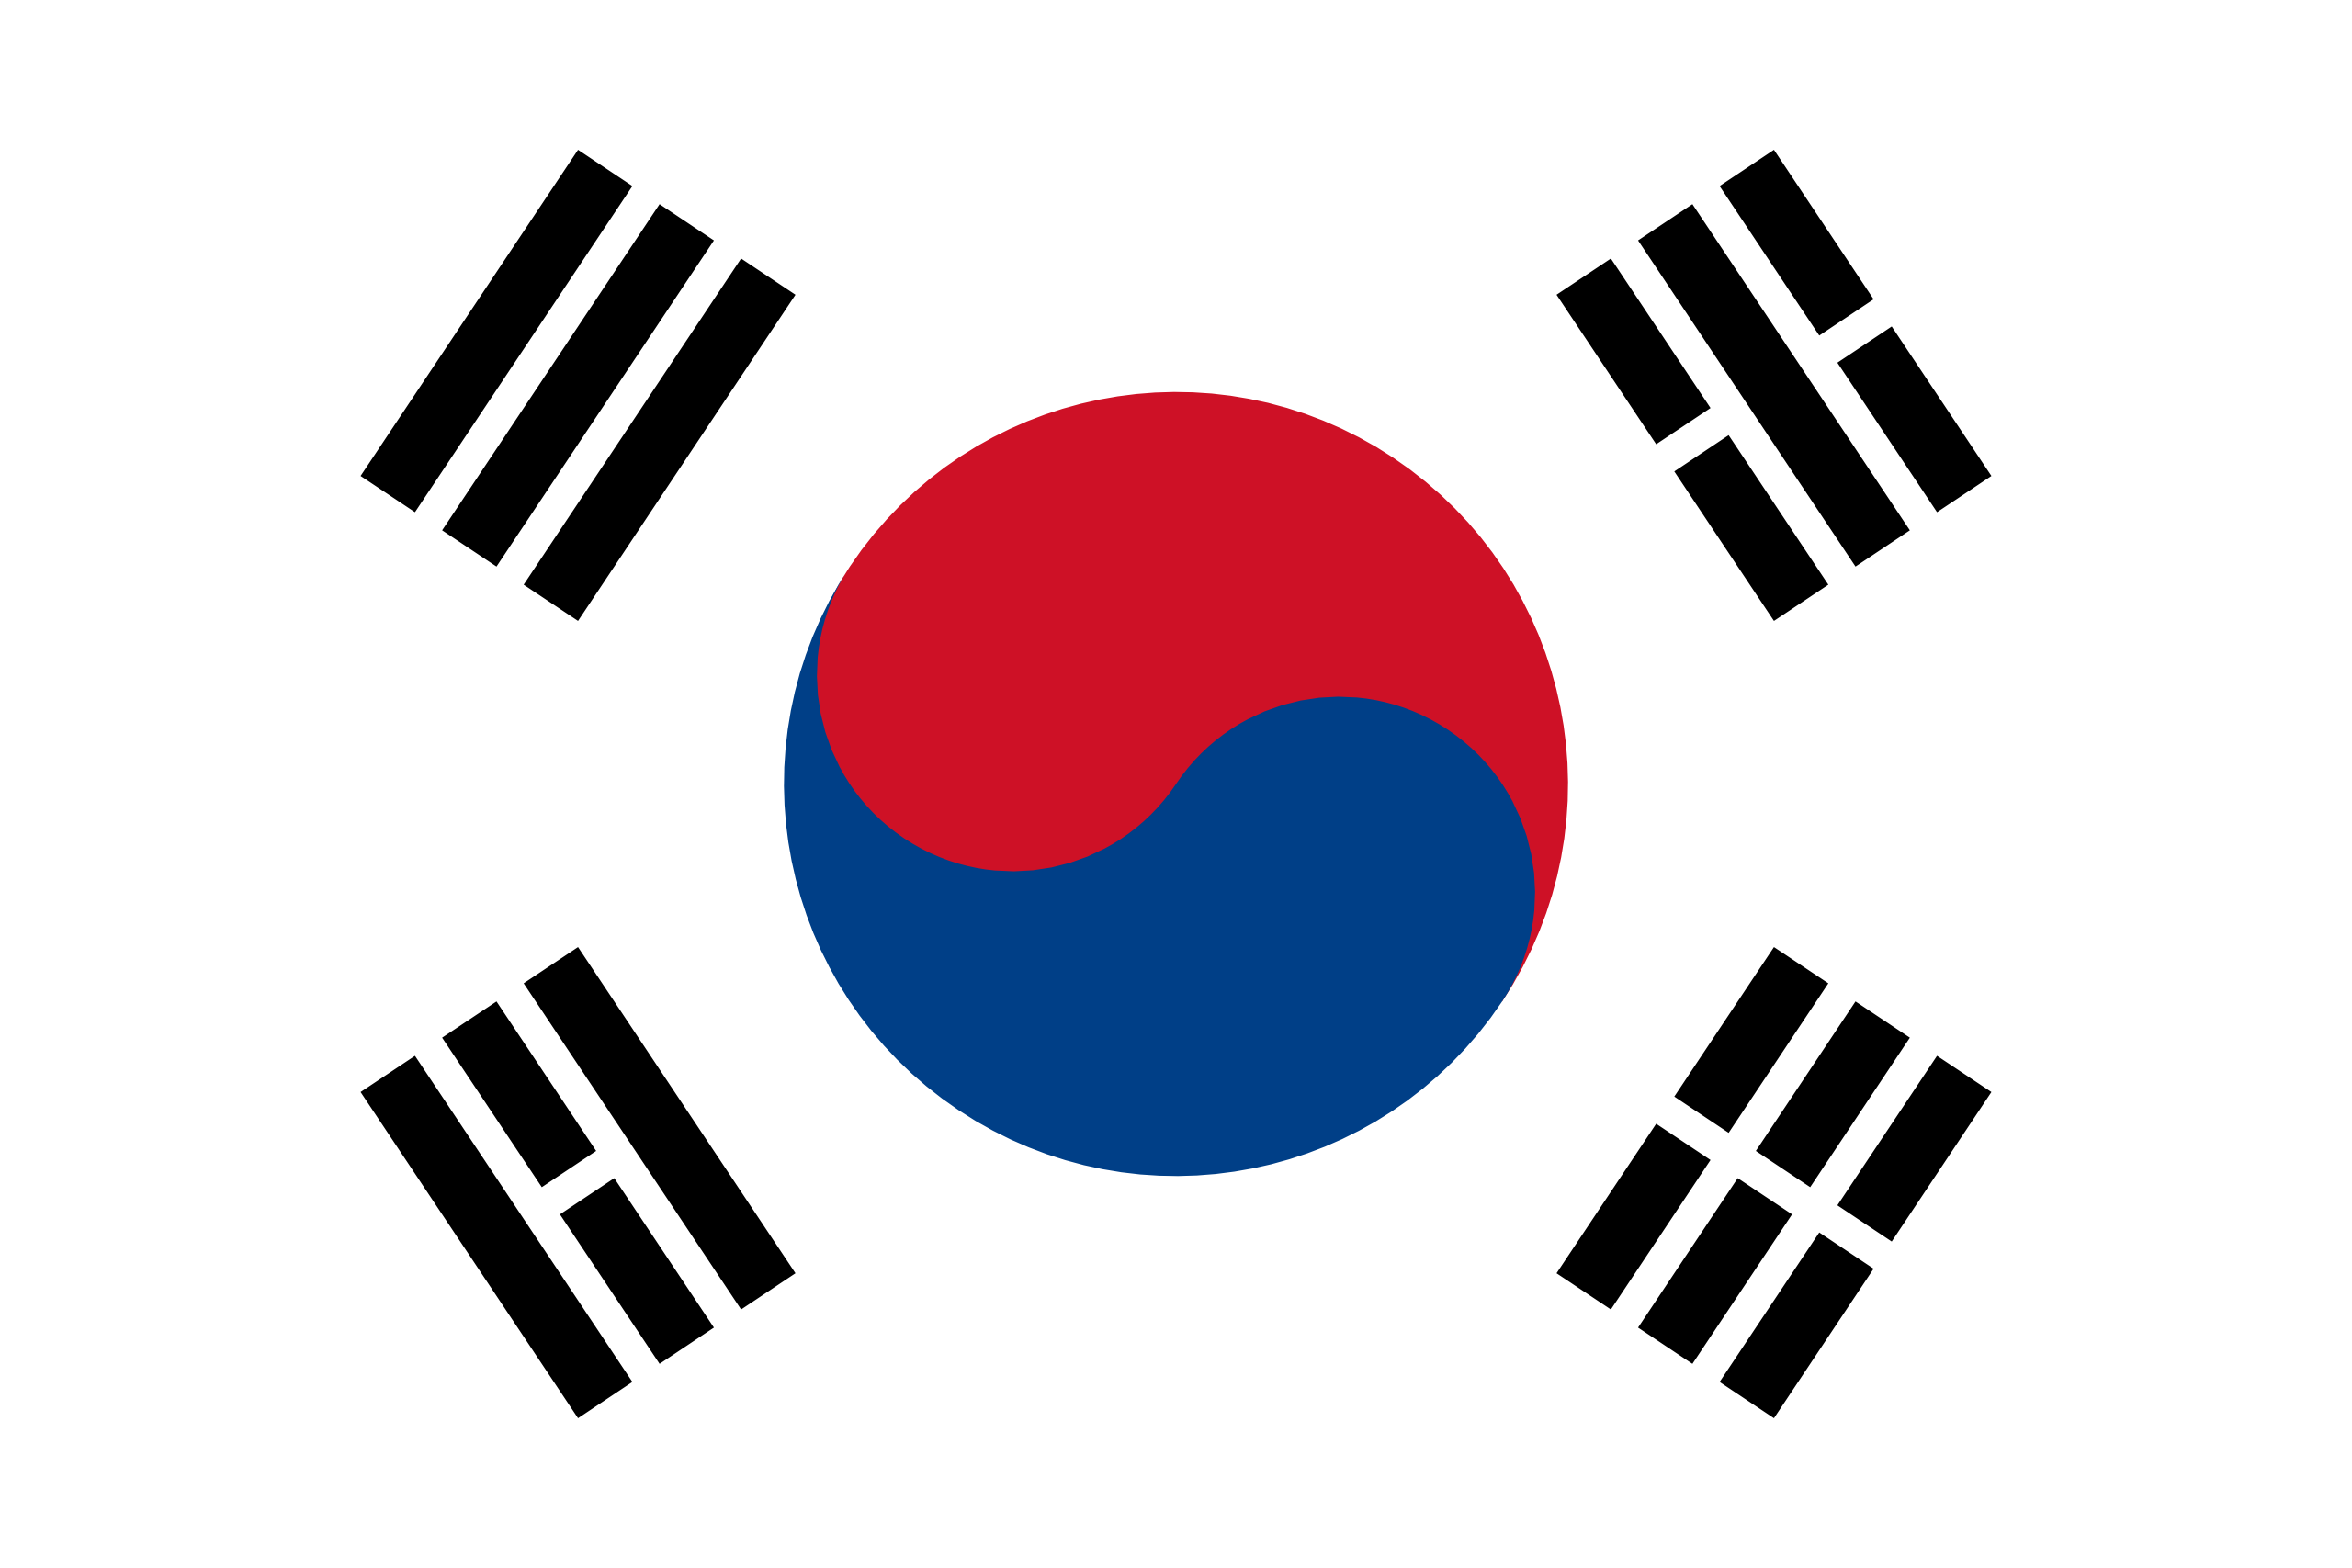 corea del sur, देश, emblema, लोग�प्रतीकbolo - HD वॉलपेपर - प्रोफेसर-falken.com